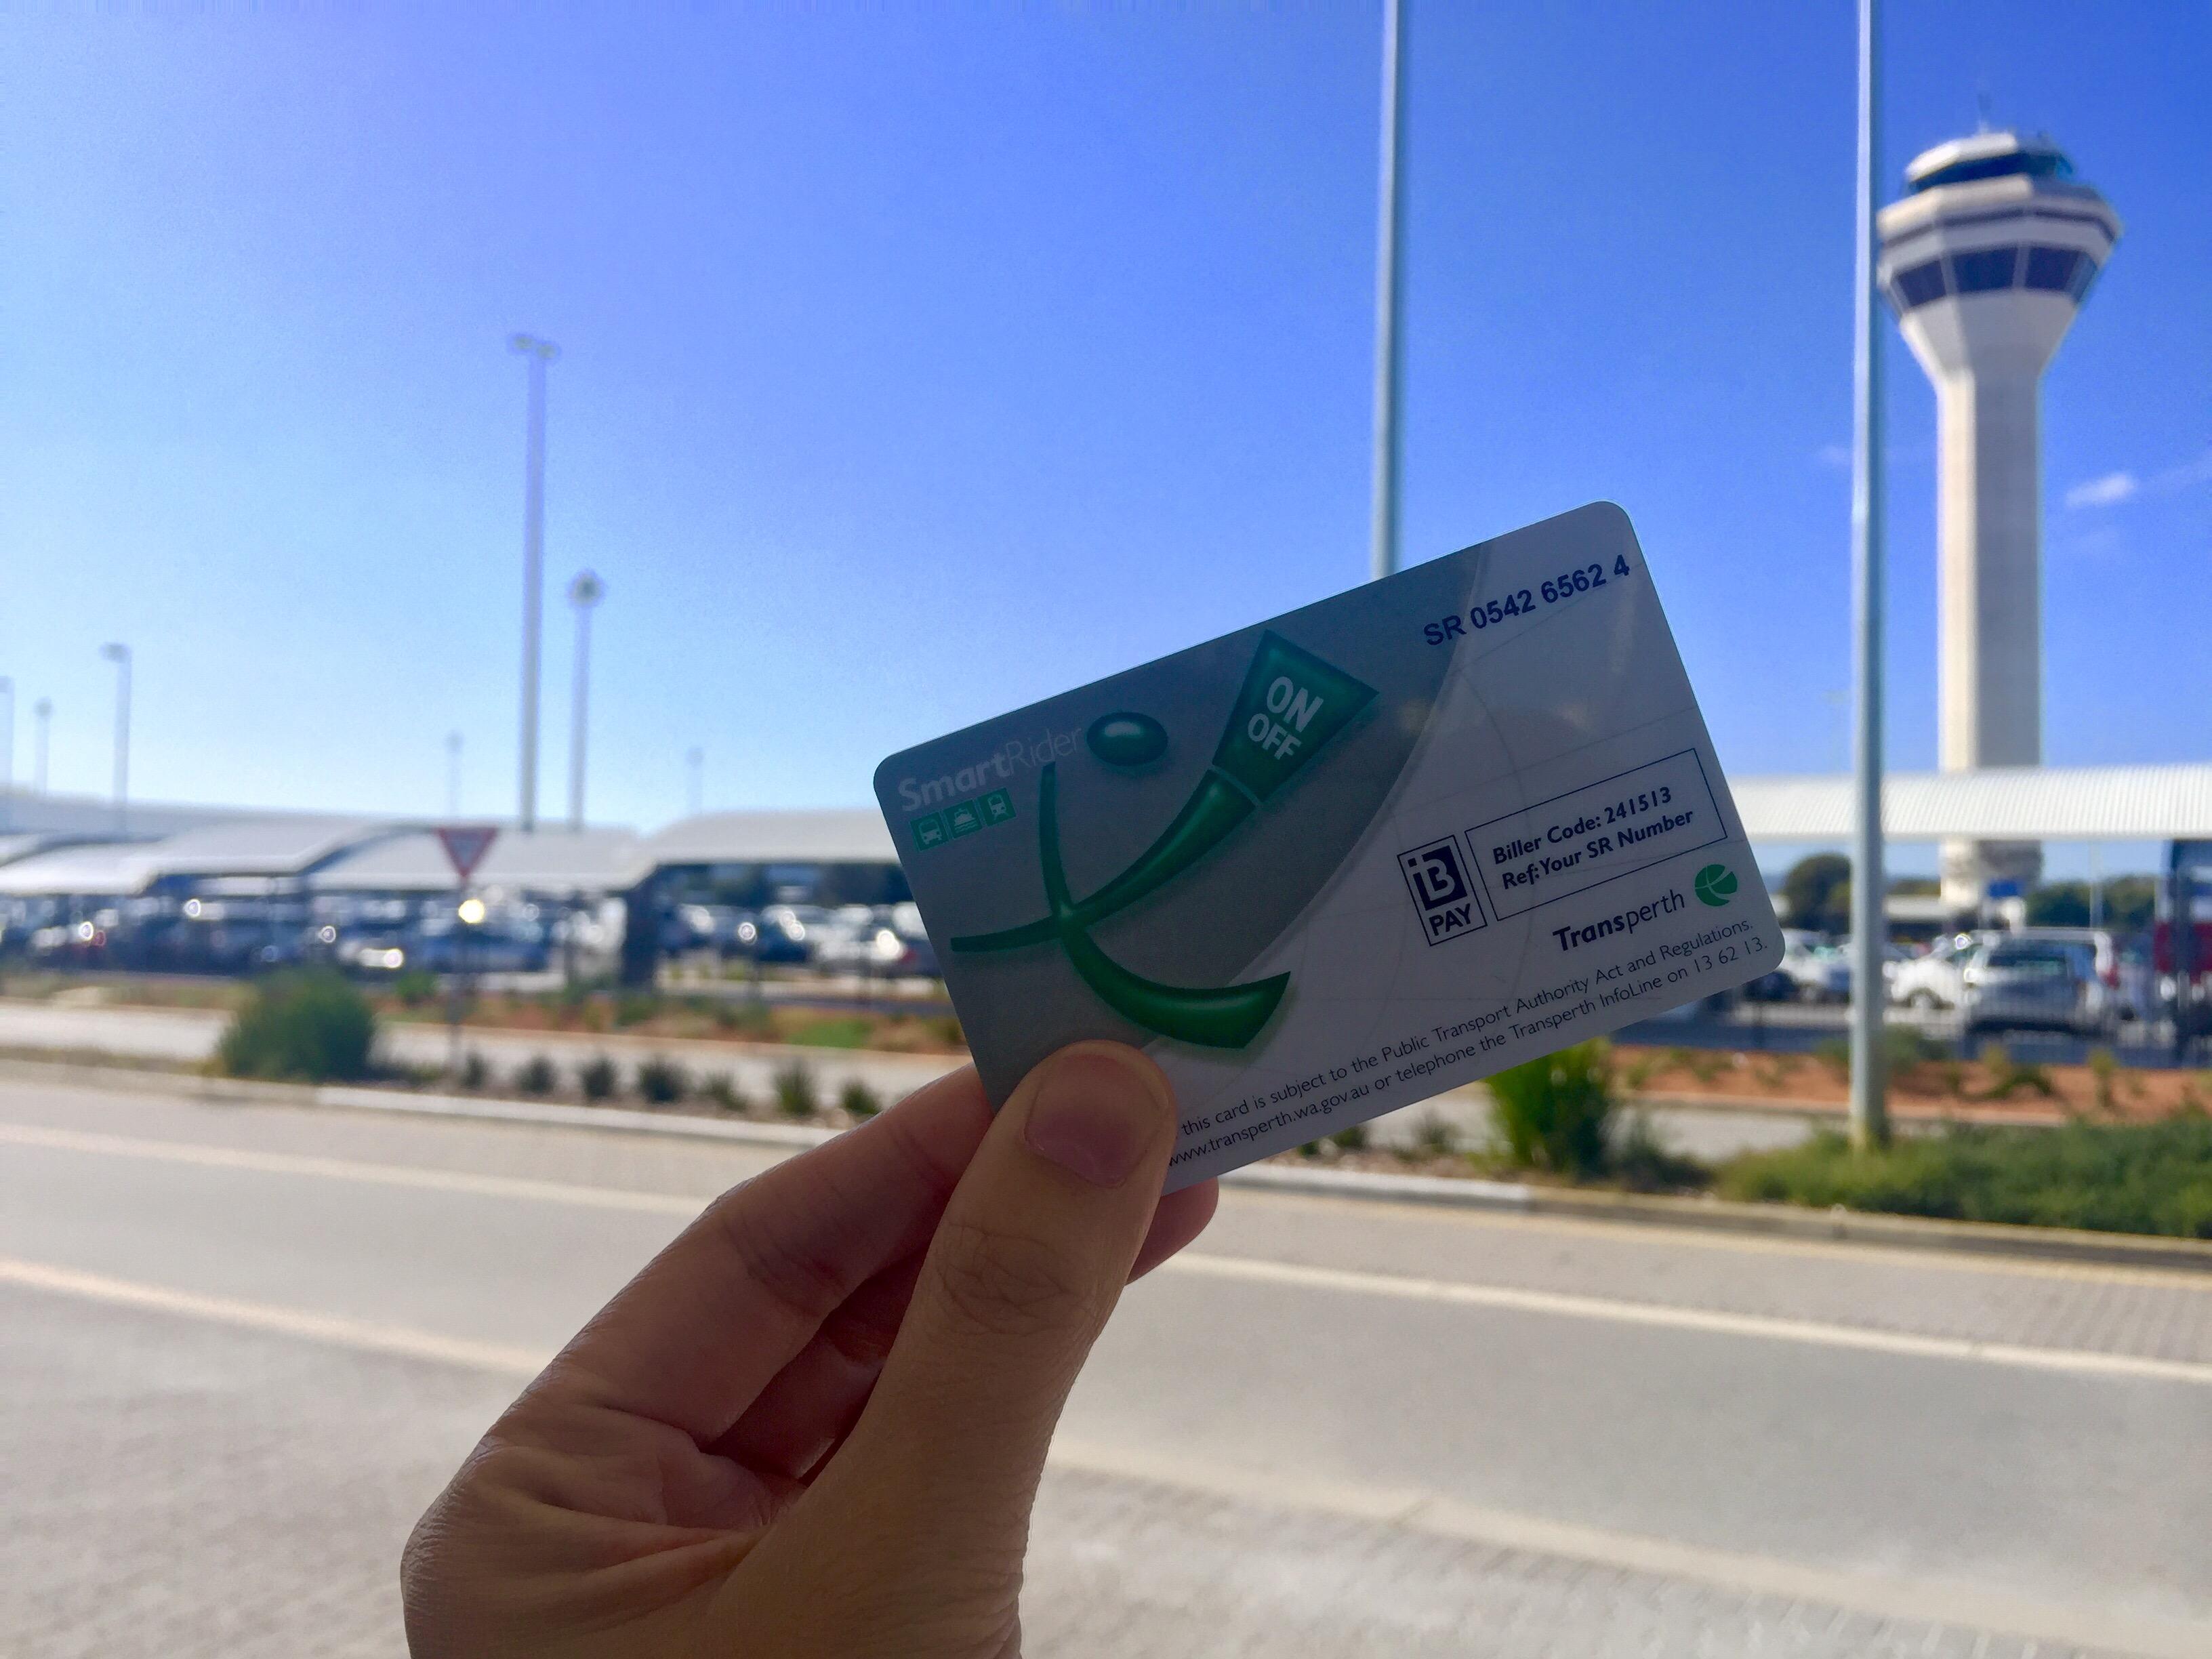 [Perth 柏斯 2016] 給第一次去澳洲柏斯的我們 @ 6日 RM2.5k 以下就能游柏斯 – TravelWithChewFamily